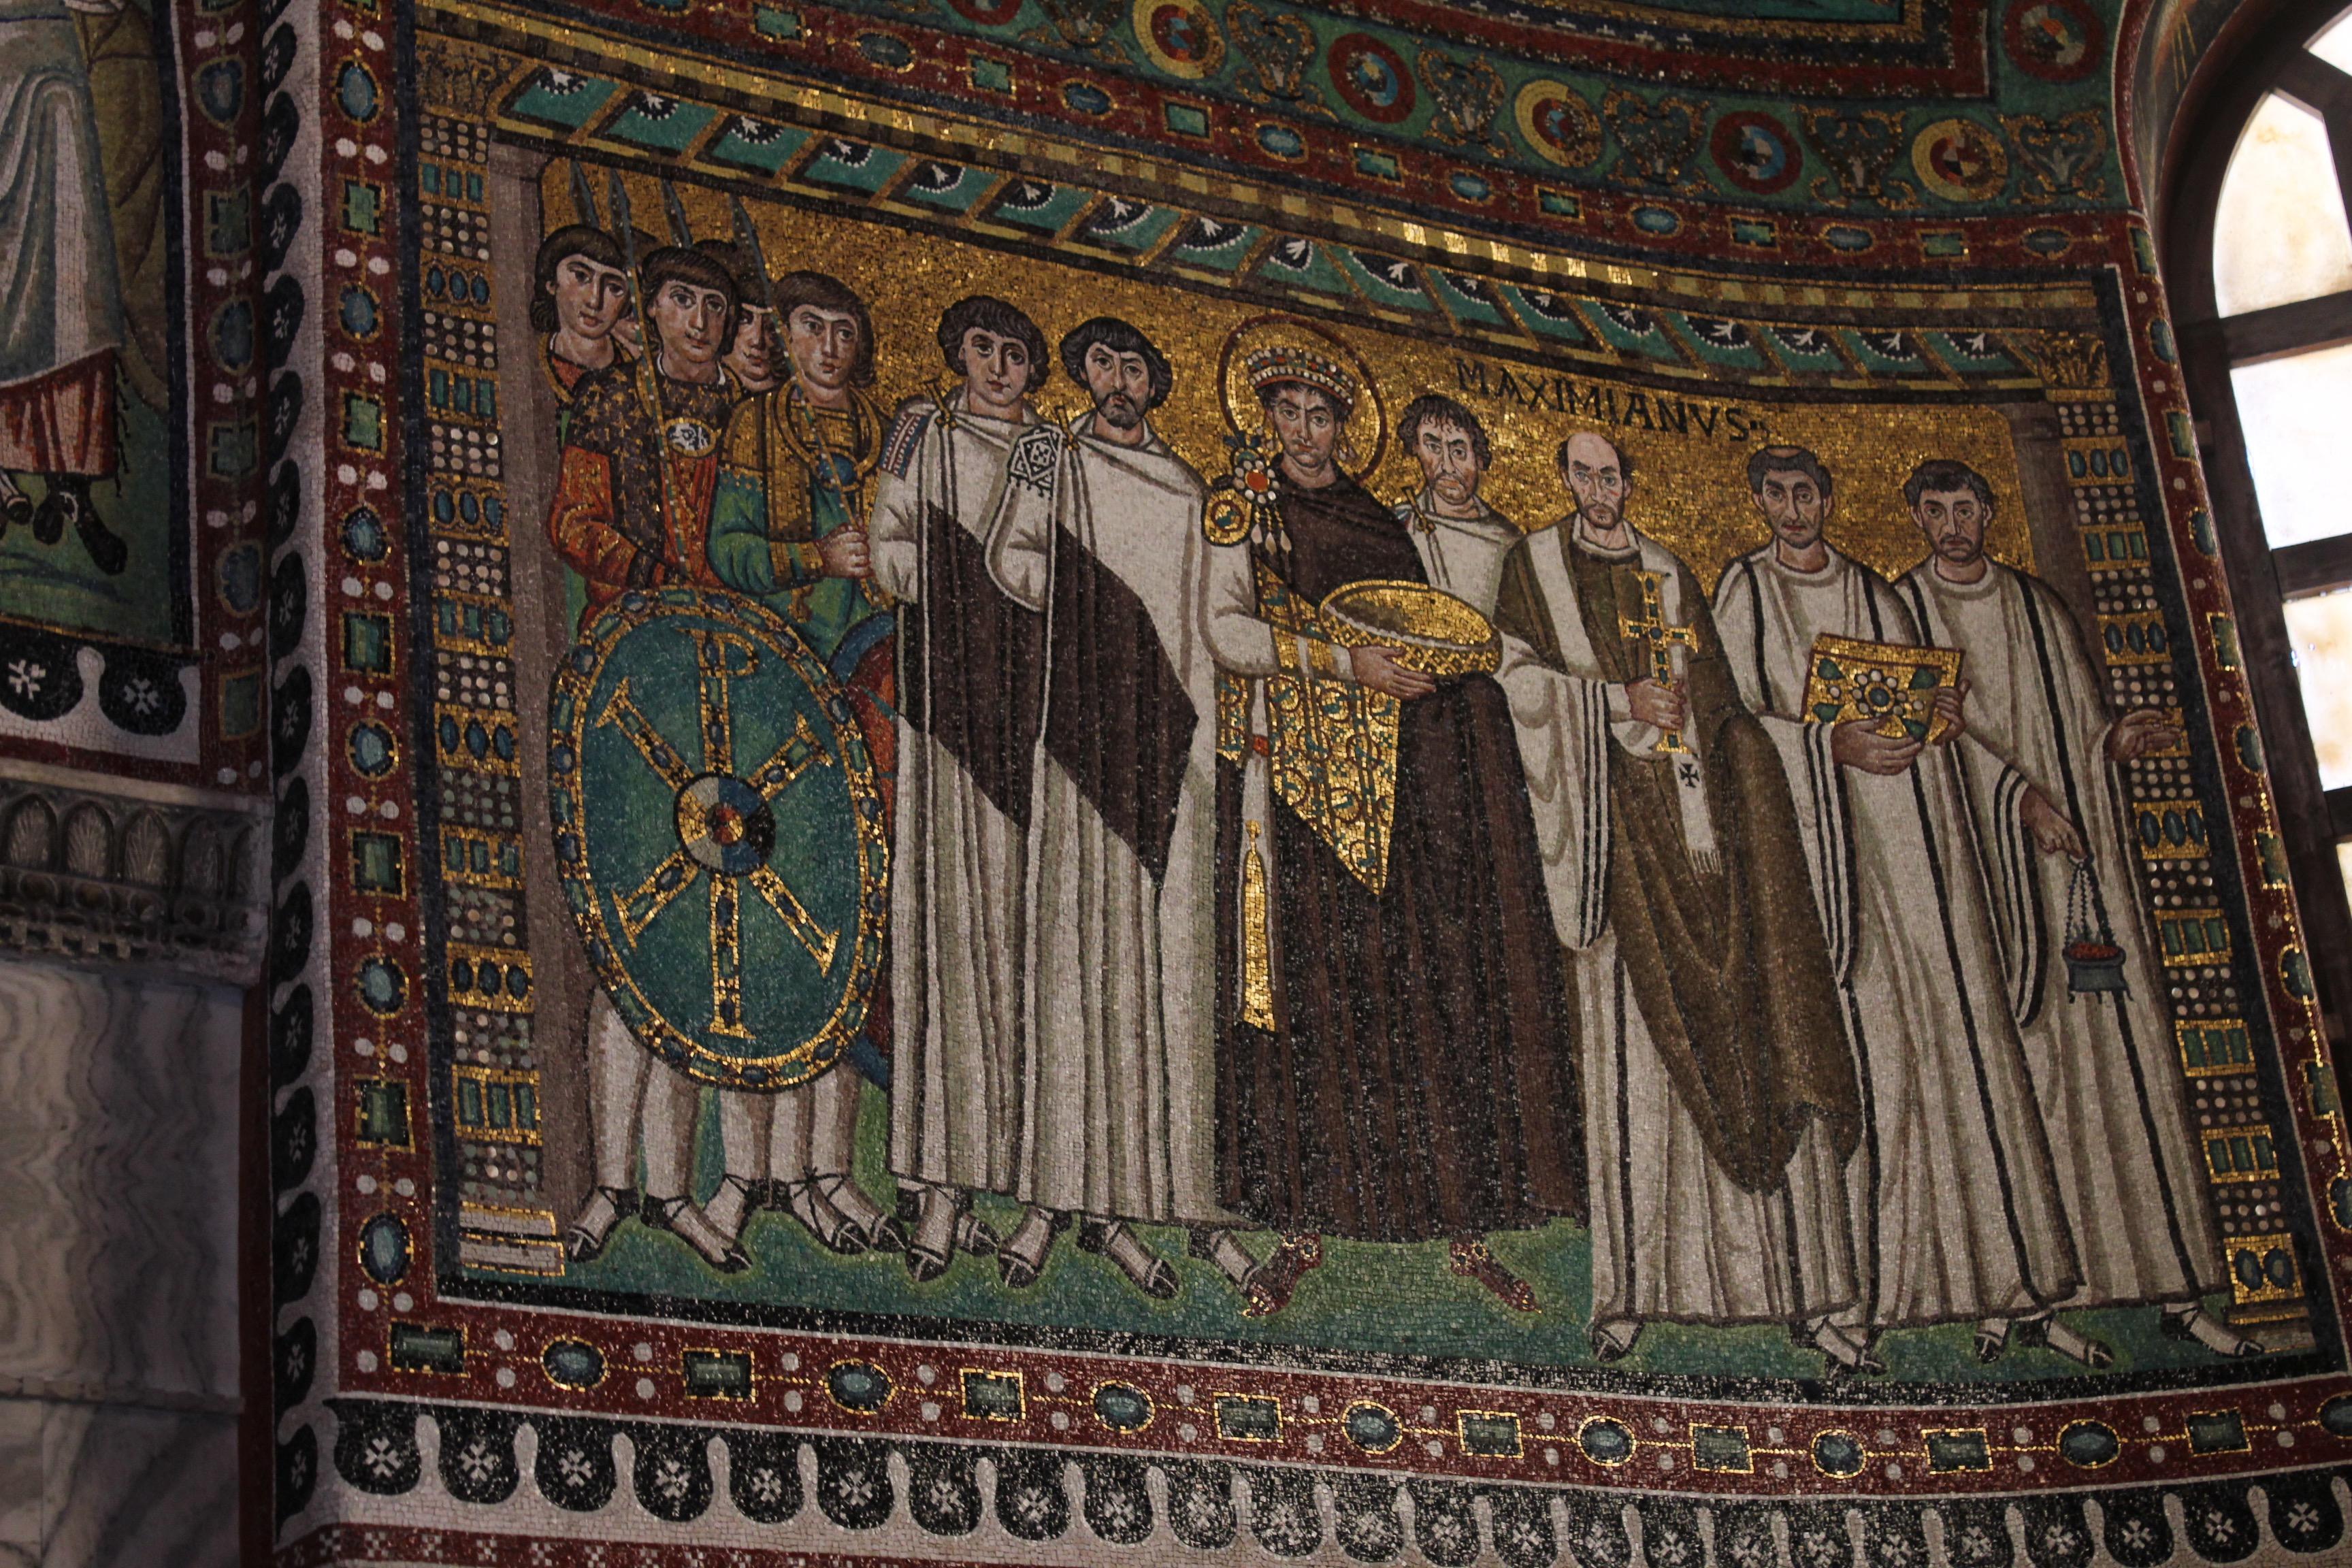 The emperor Justinian I